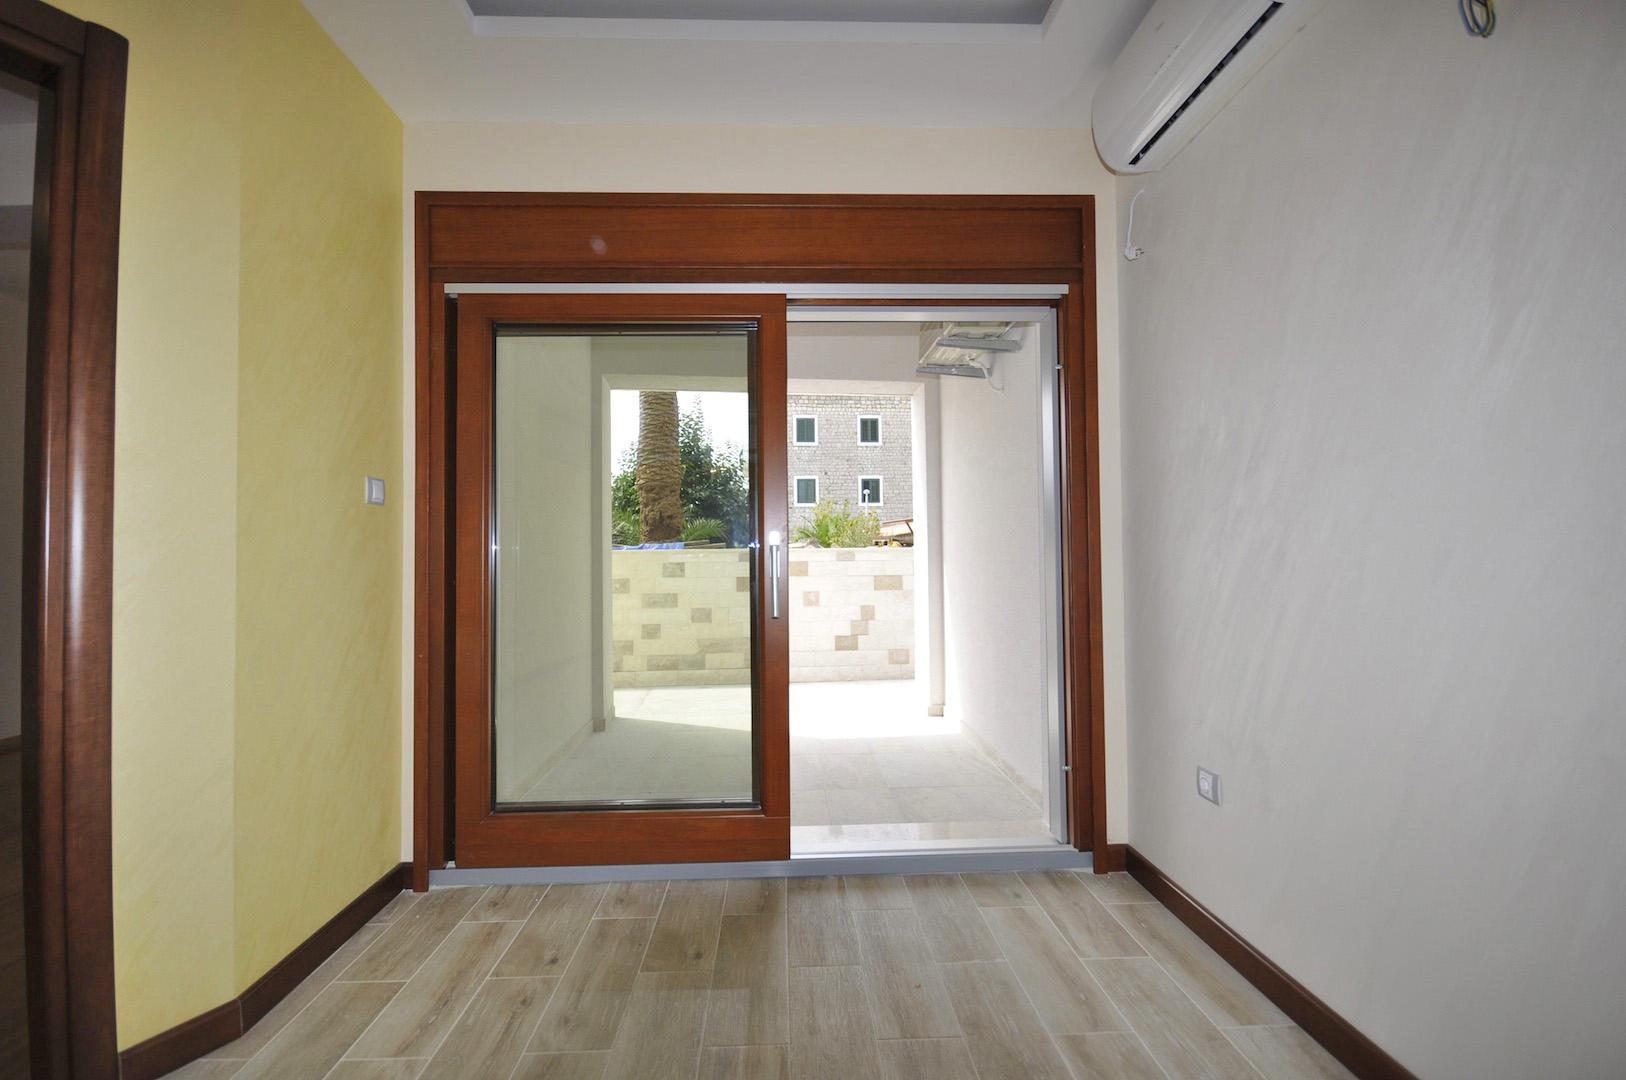 Herceg novi meljine luxury apartments 37m2 90m2 on for Apartment design 90m2